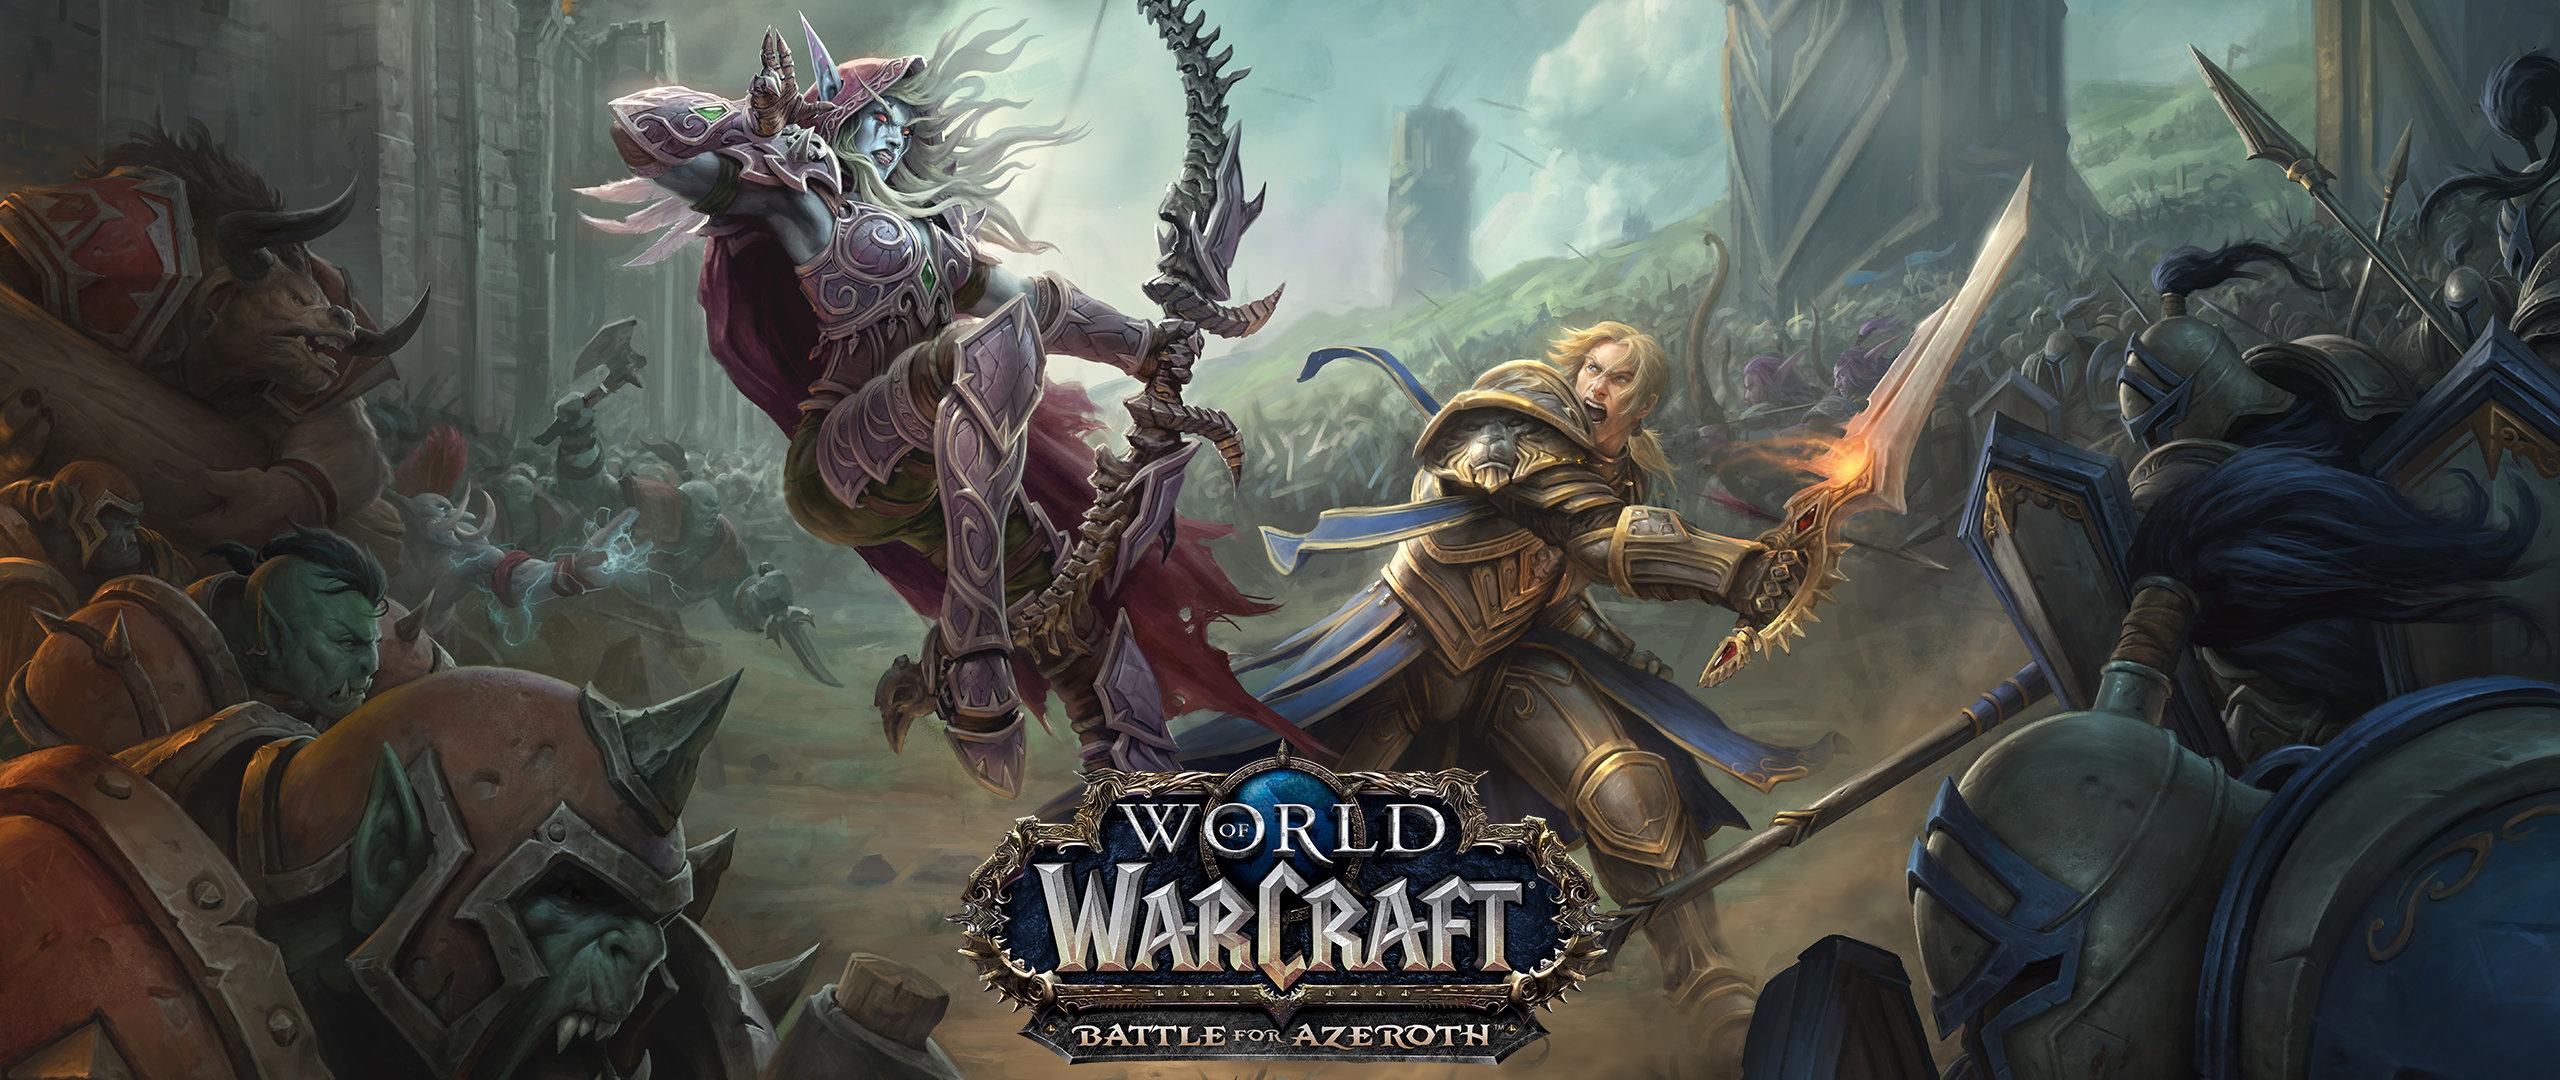 World of warcraft release date in Brisbane